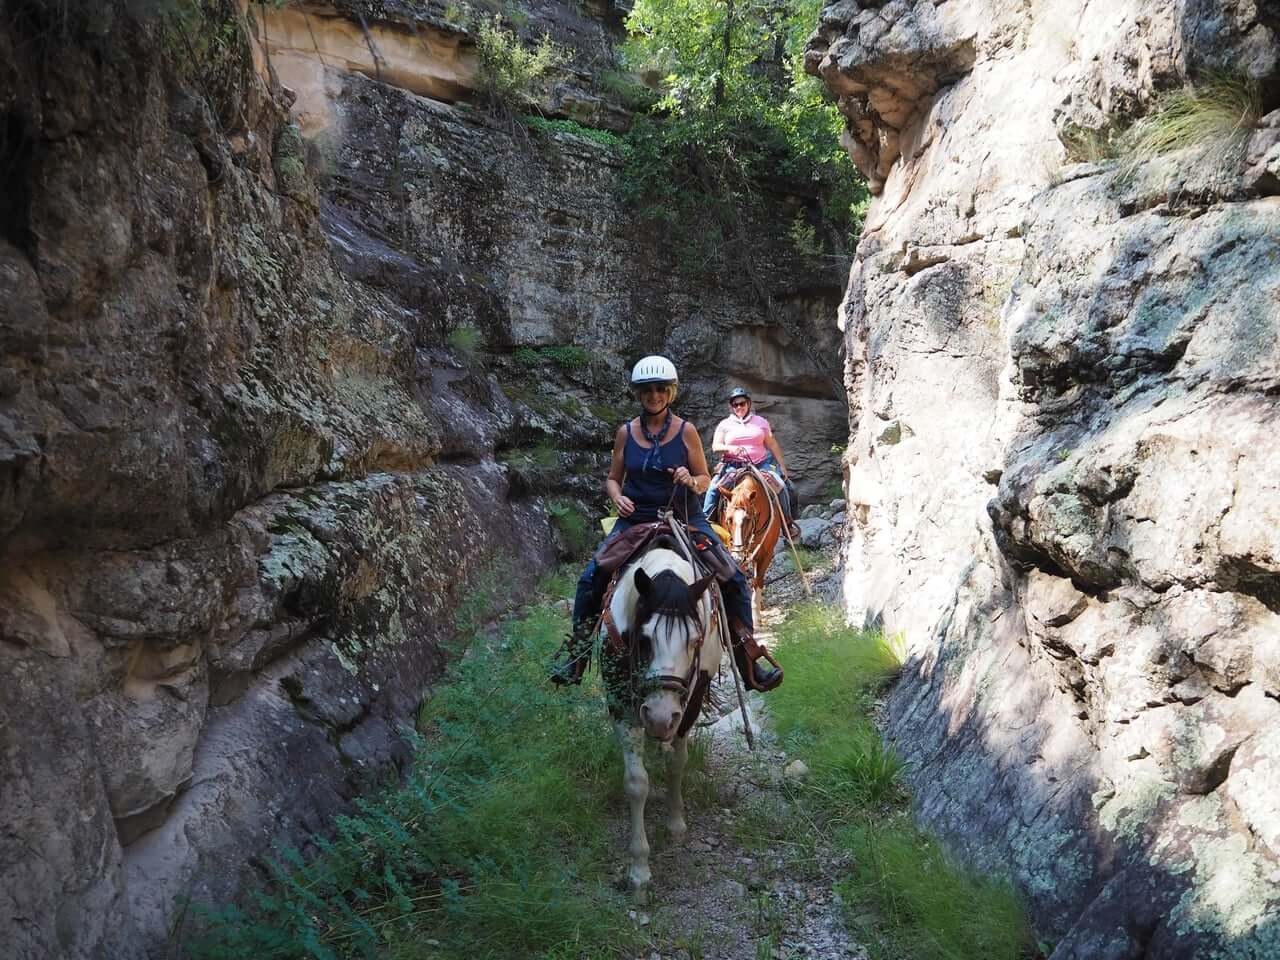 trail_riding_19-1.jpg